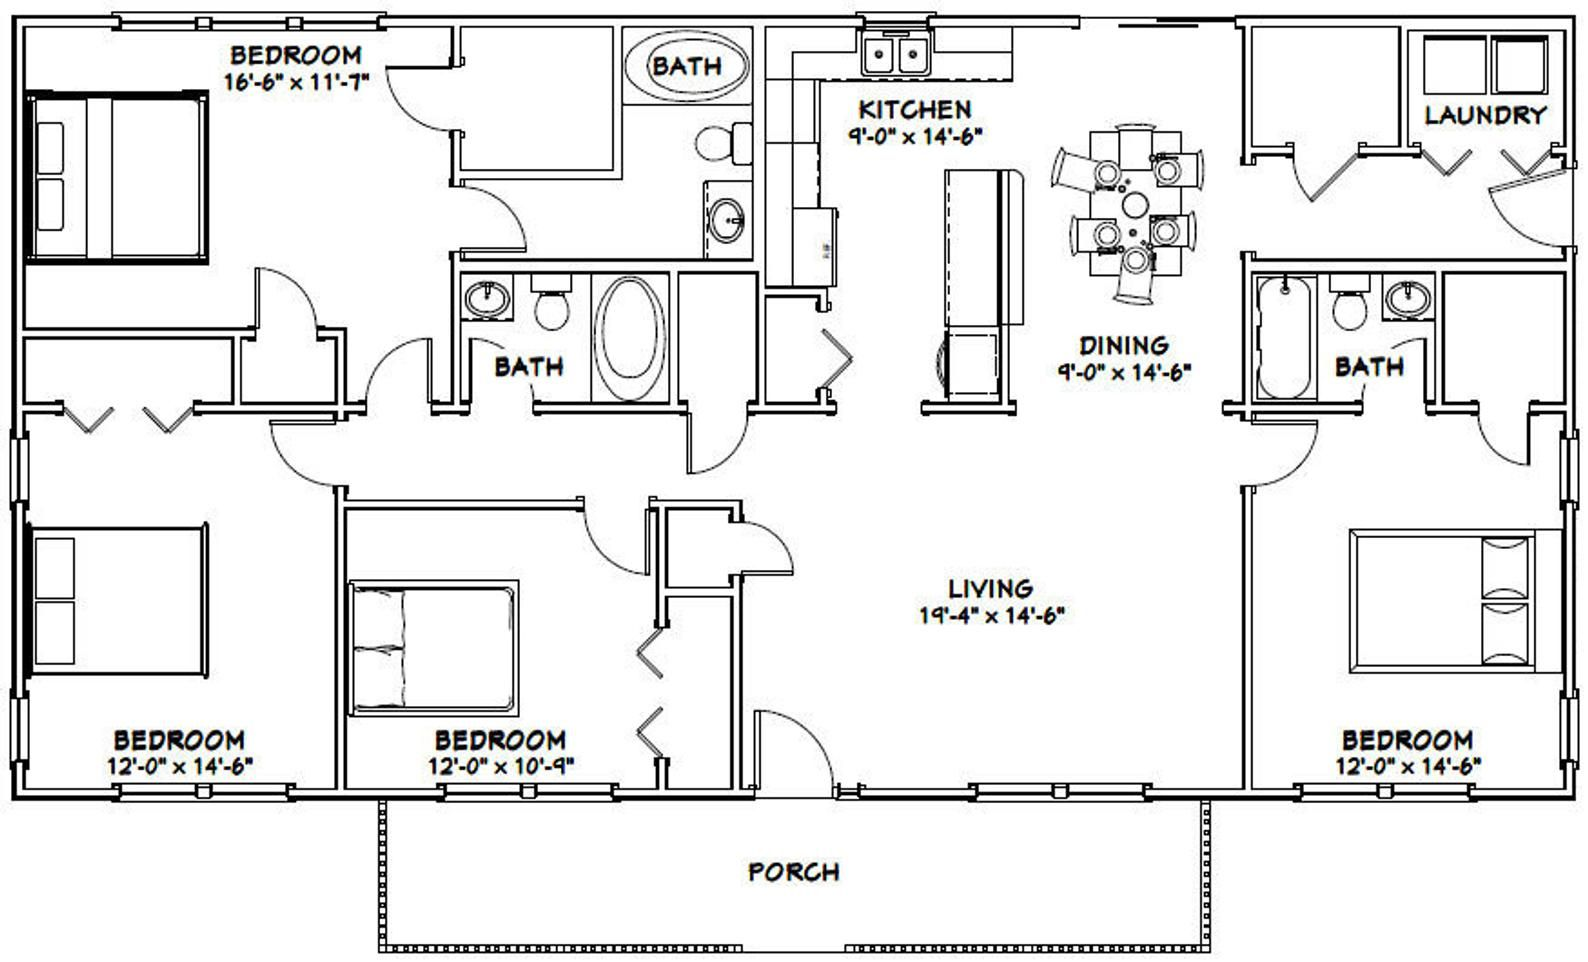 60x30 House 4Bedroom 3Bath 1,800 sq ft PDF